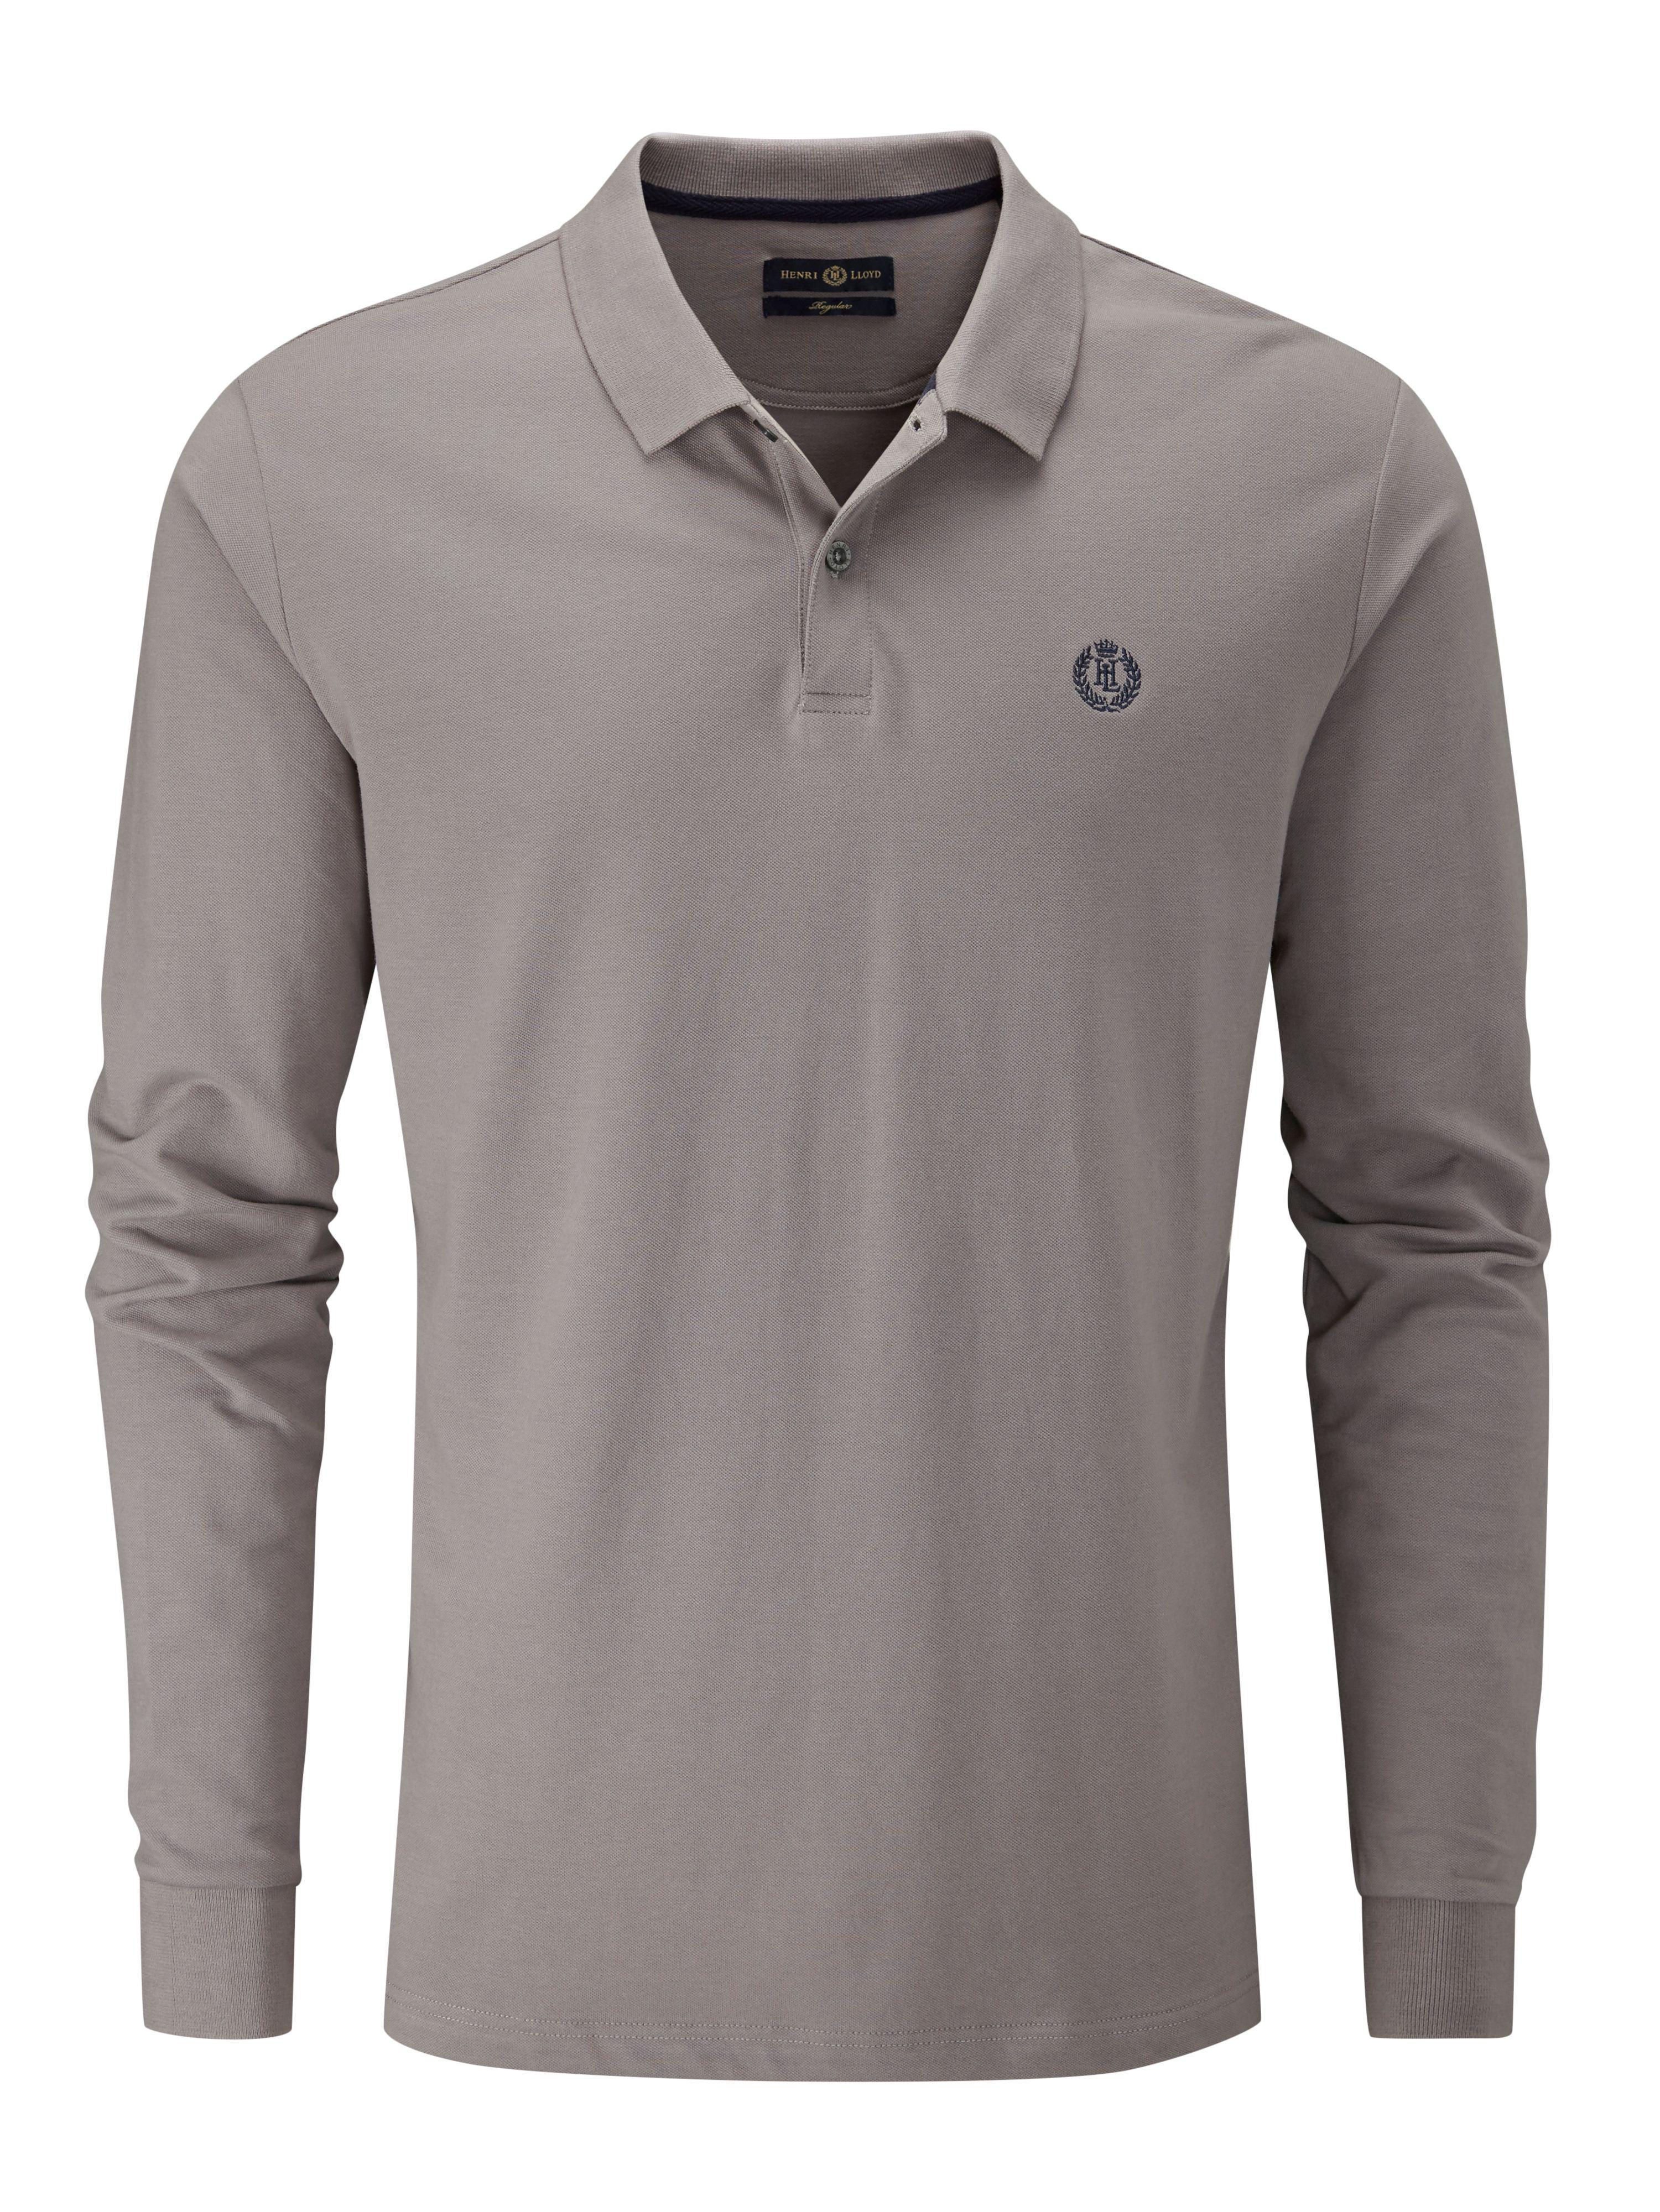 2daad50a7 Lyst - Henri Lloyd Musburry Regular Long Sleeve Polo in Gray for Men